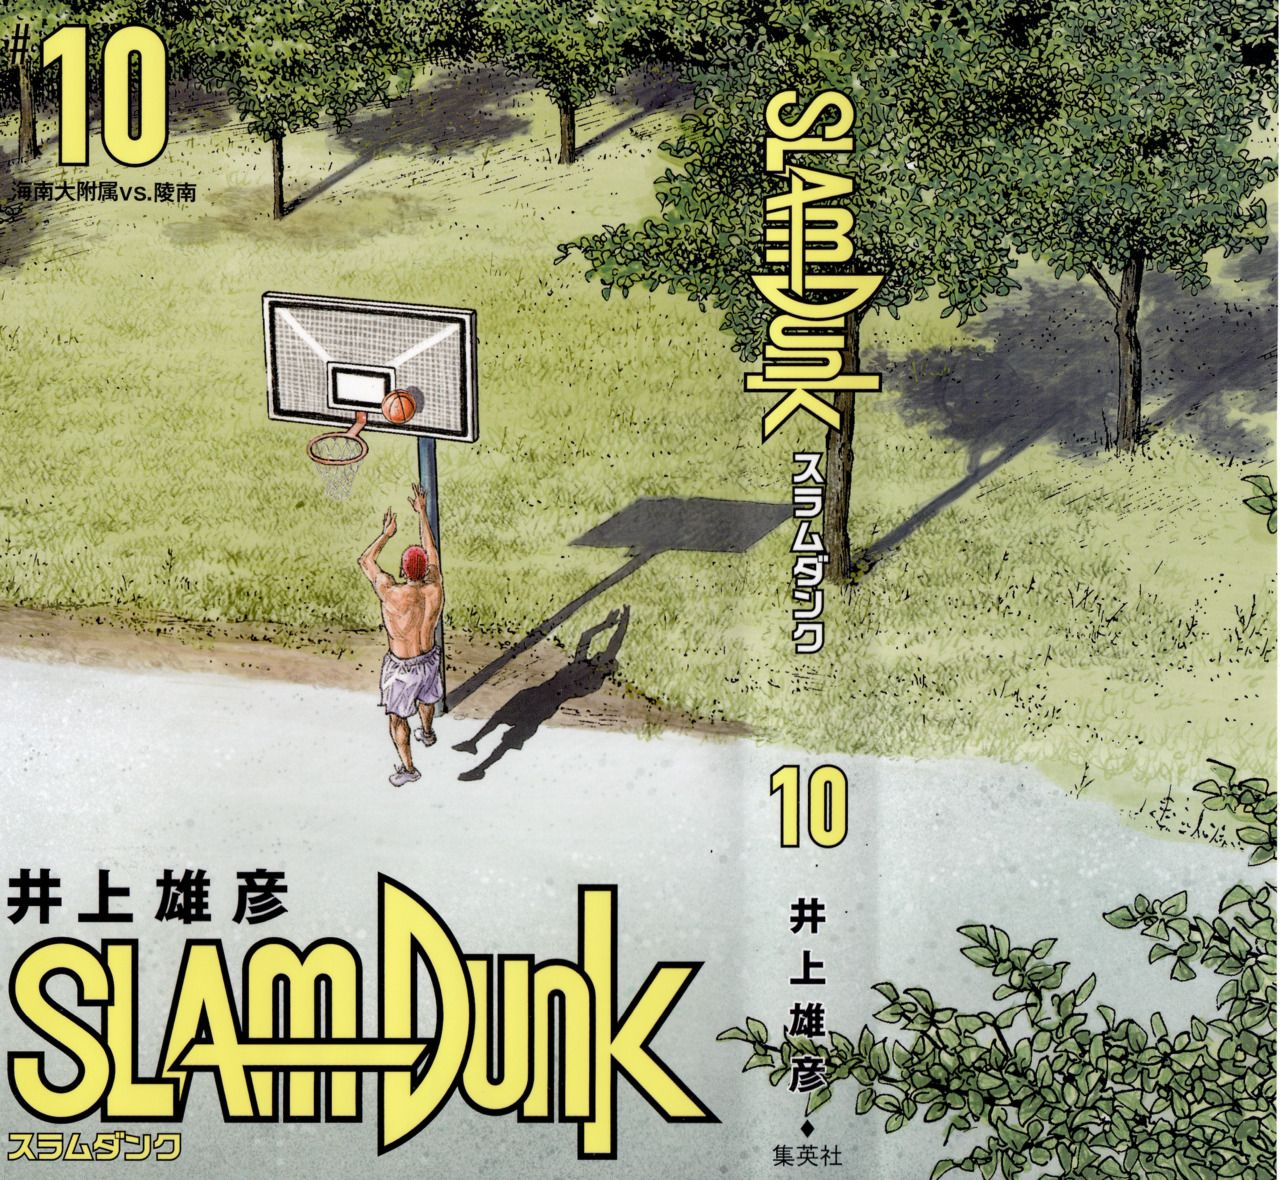 Vol 10 Slam Dunk